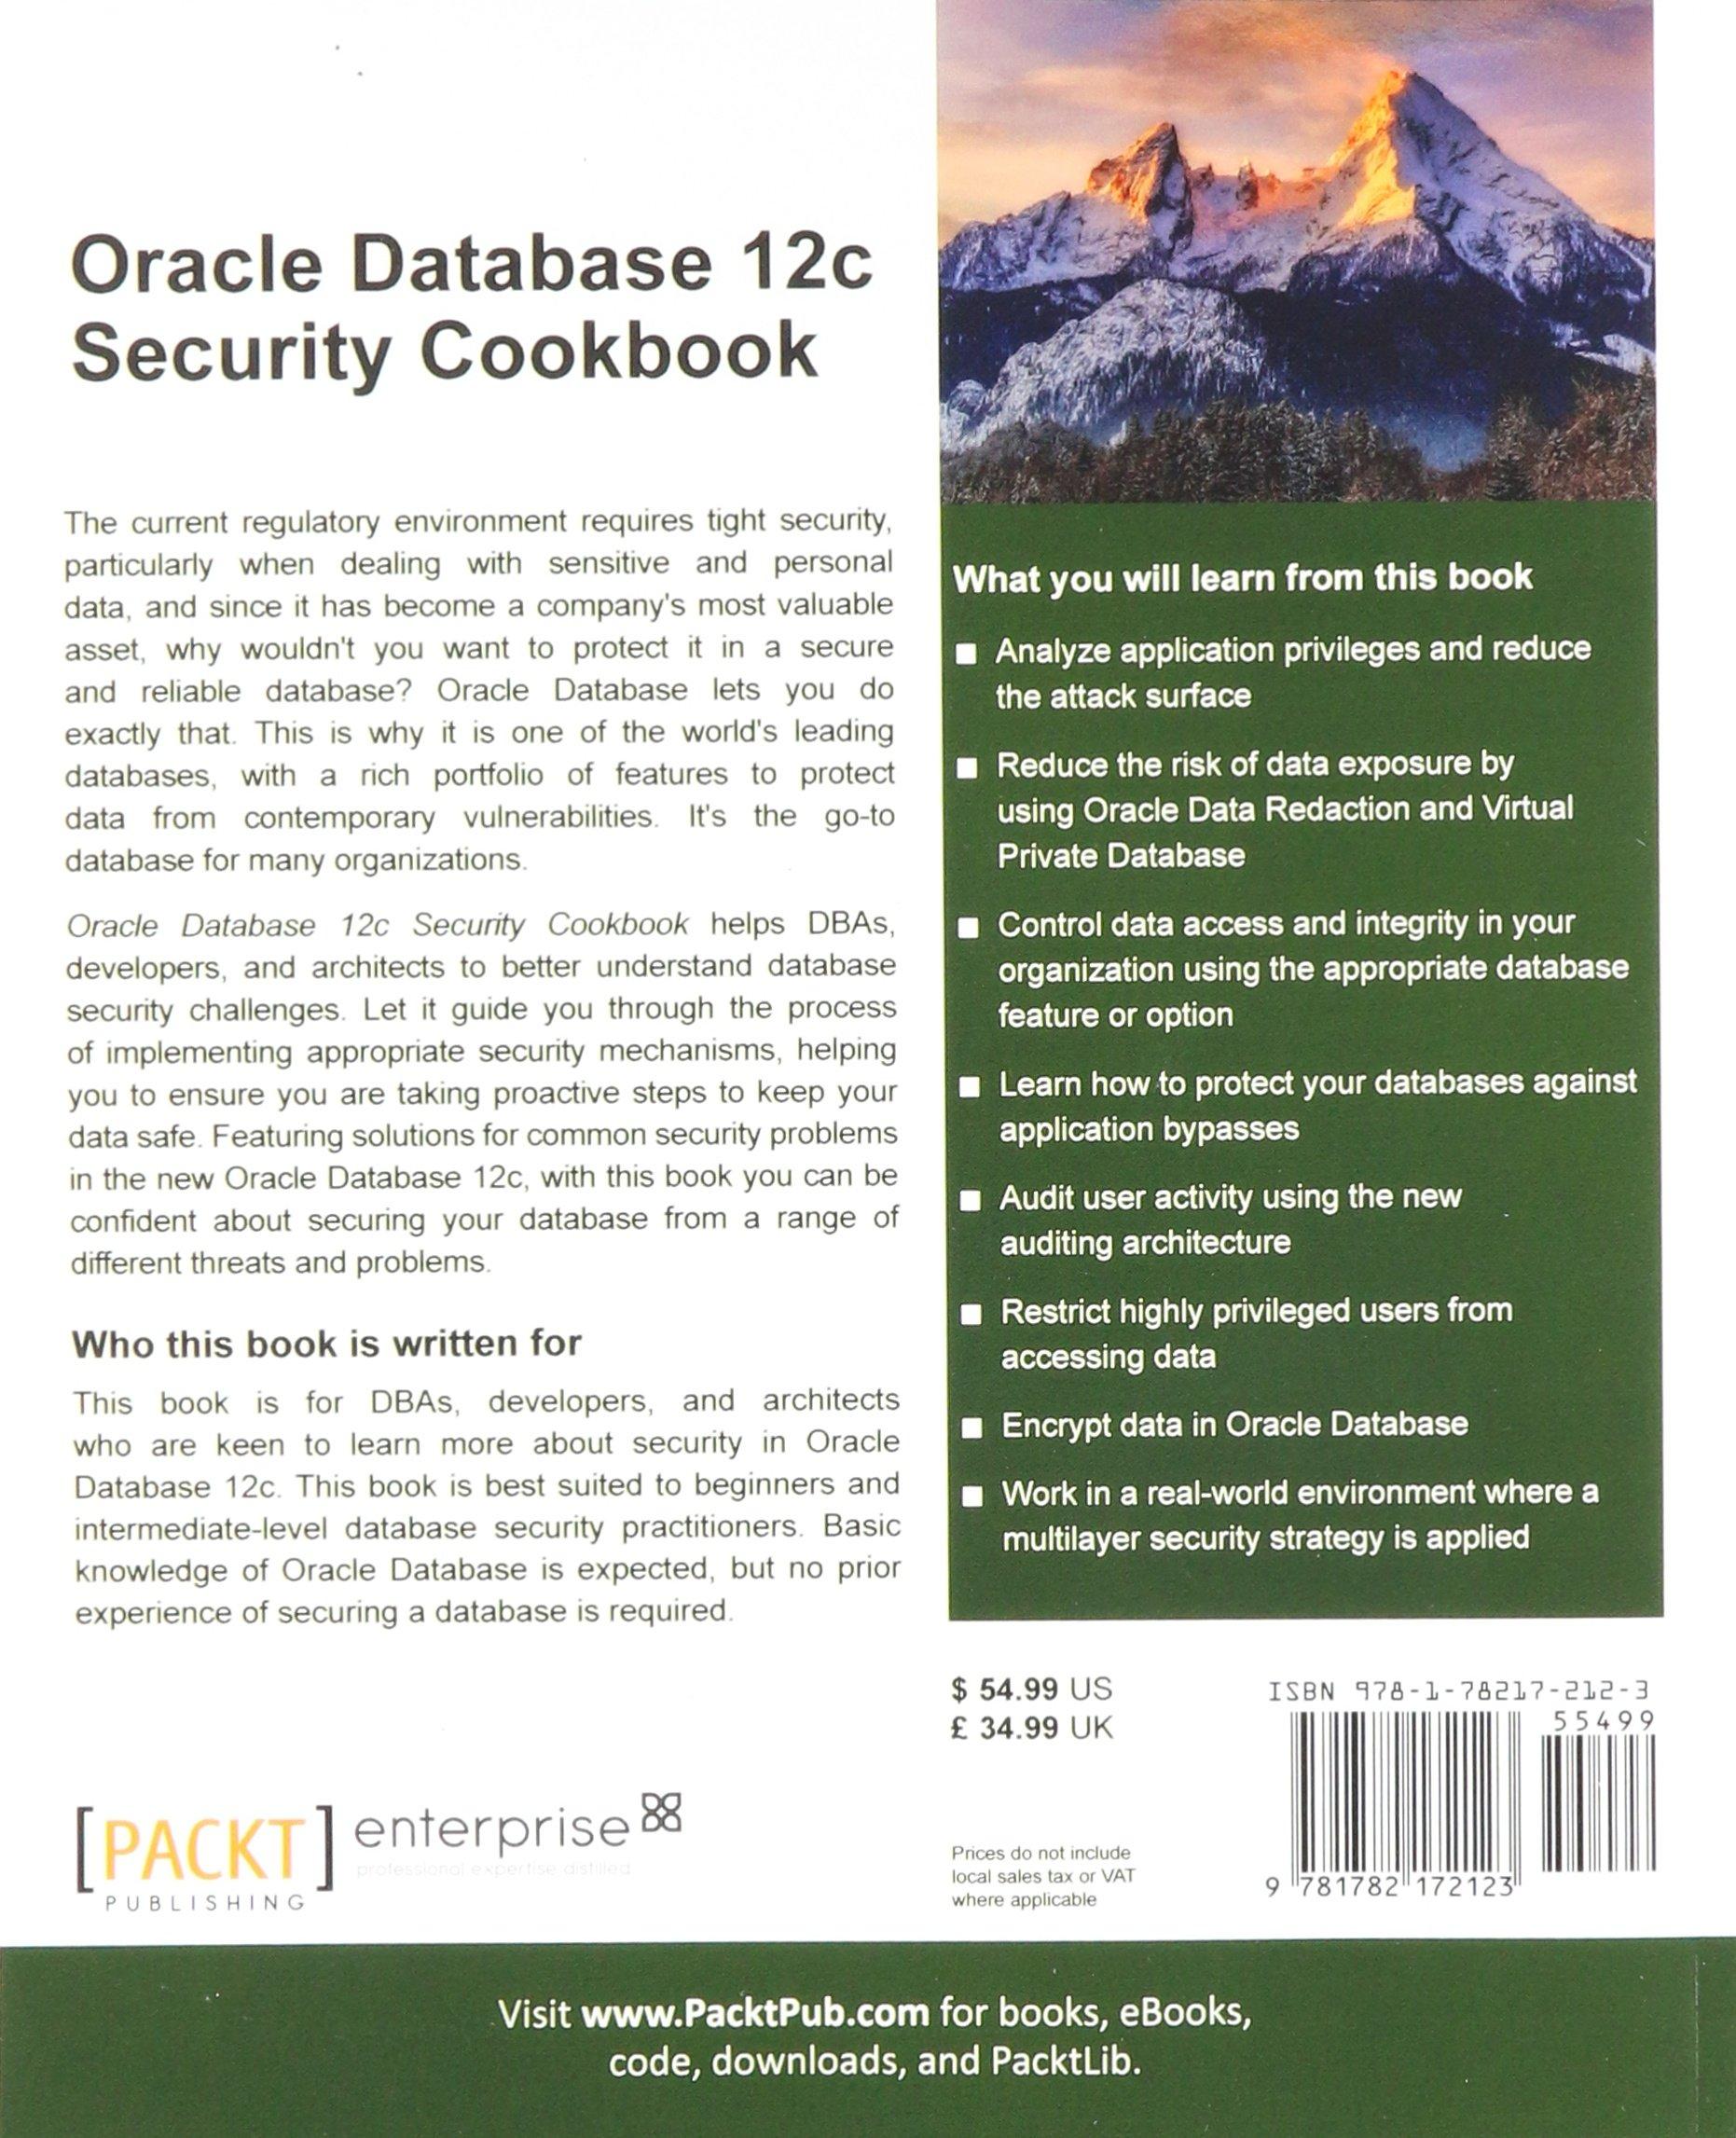 Oracle Database 12c Security Cookbook Zoran Pavlovic Maja Veselica And Auditing 9781782172123 Books